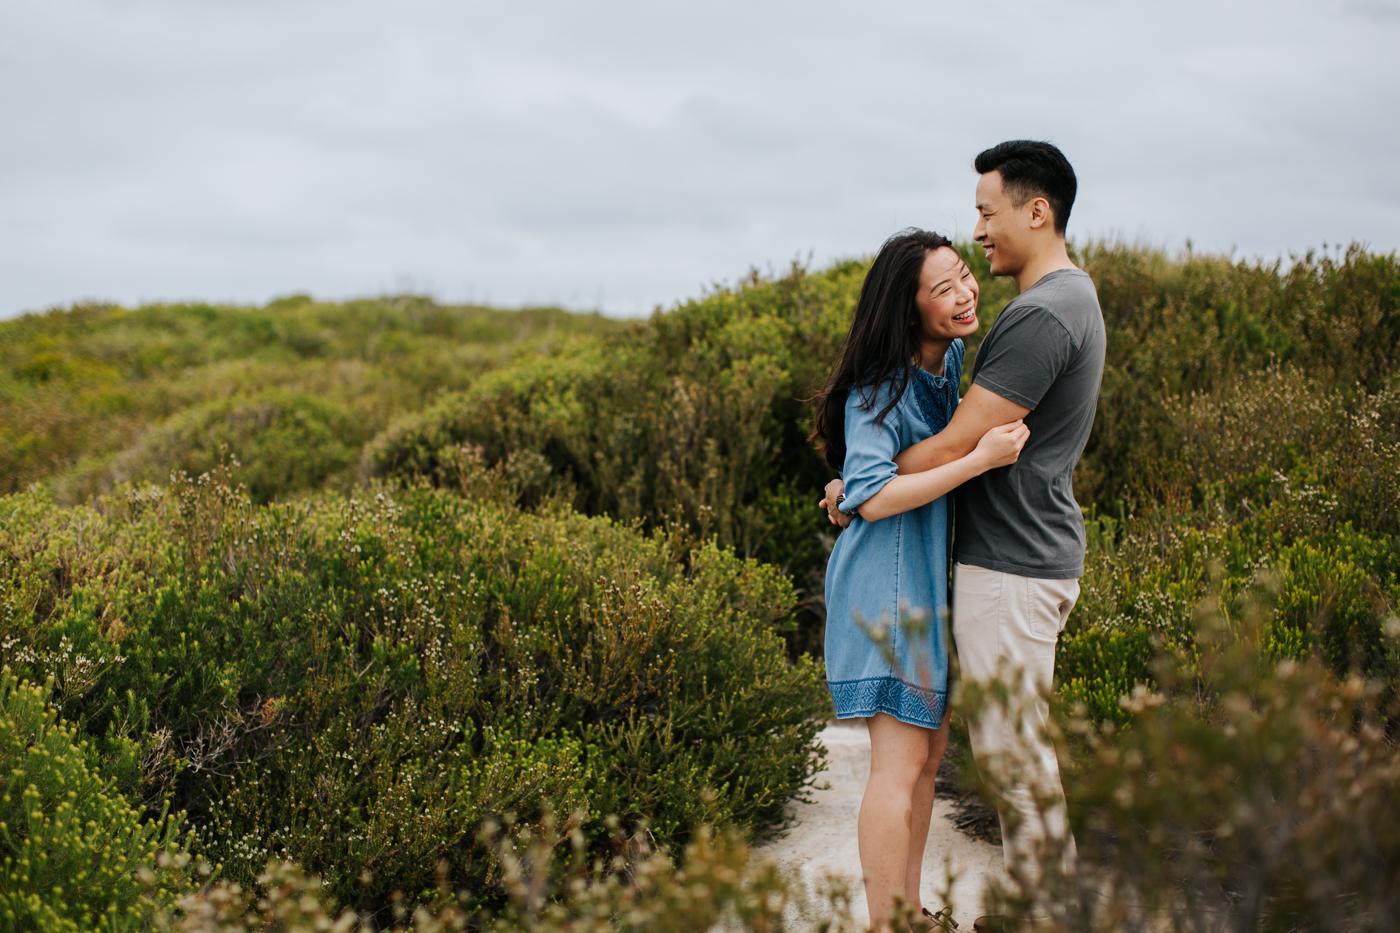 Lishien & Jason Engagement - Kurnell Cliffs - Samantha Heather Photography-3.jpg